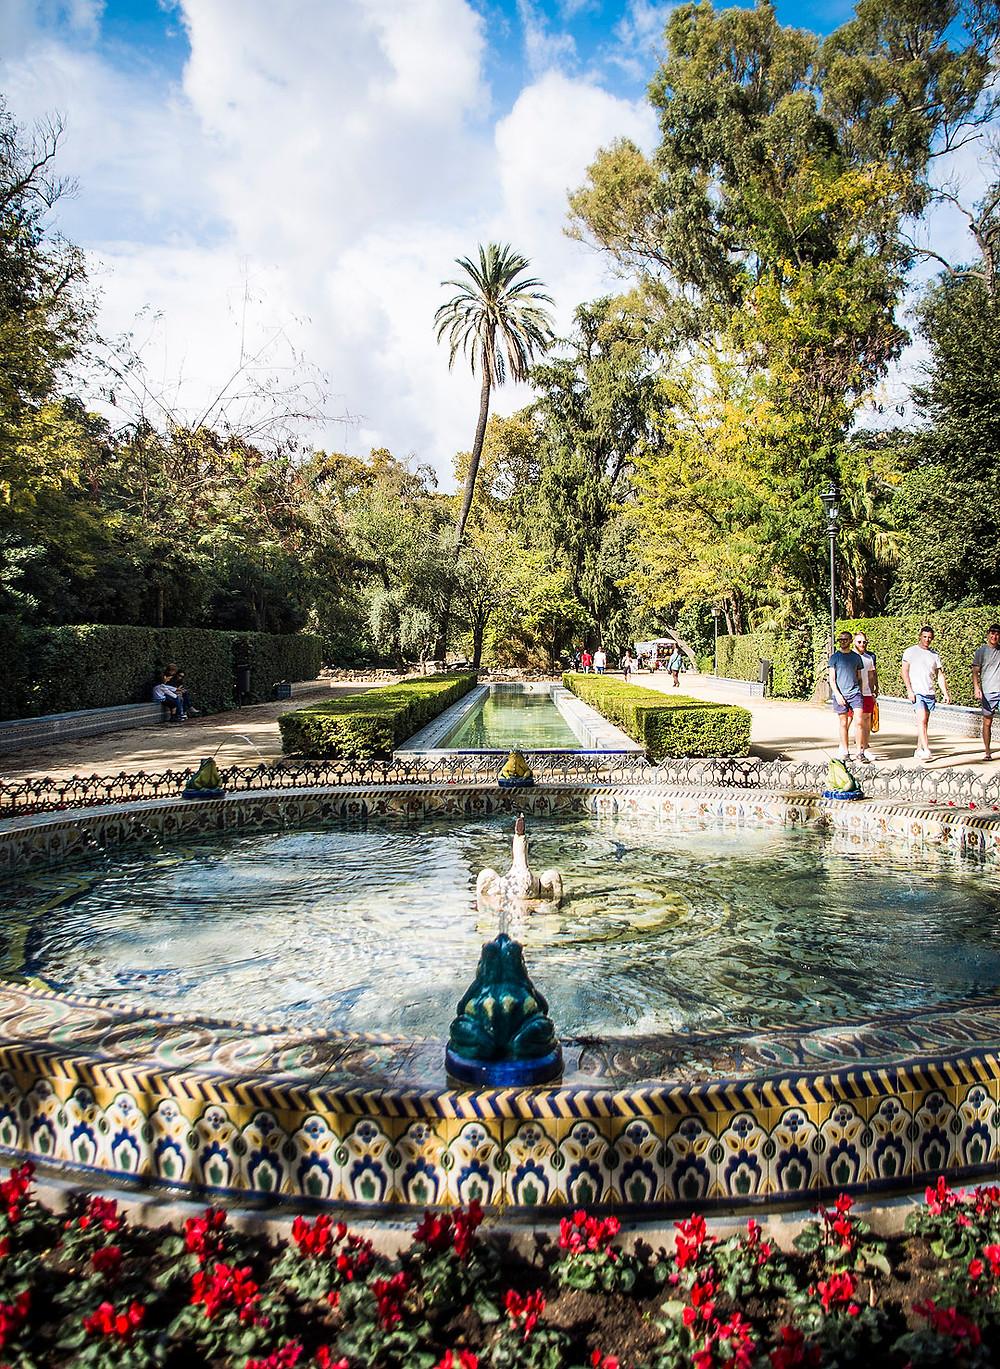 Fountain in Parque de María Luisa, Seville